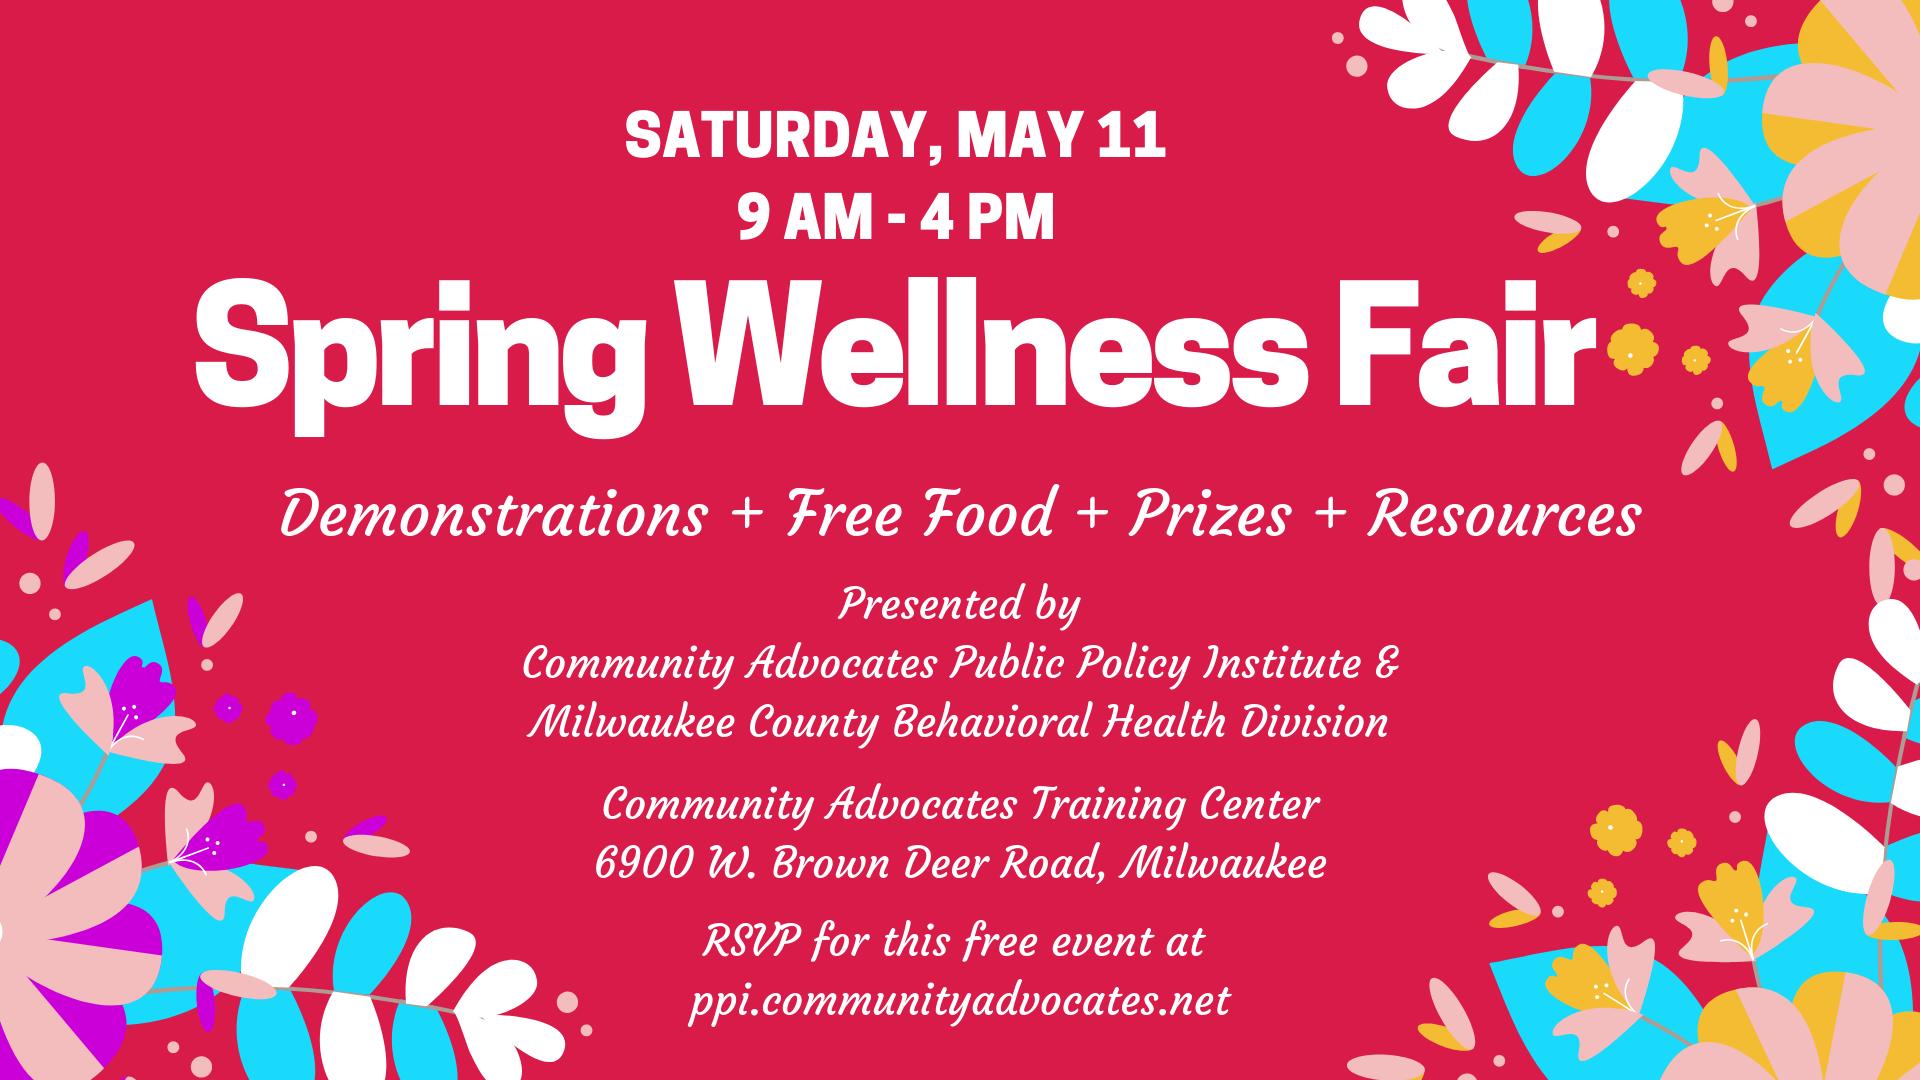 Spring Wellness Fair